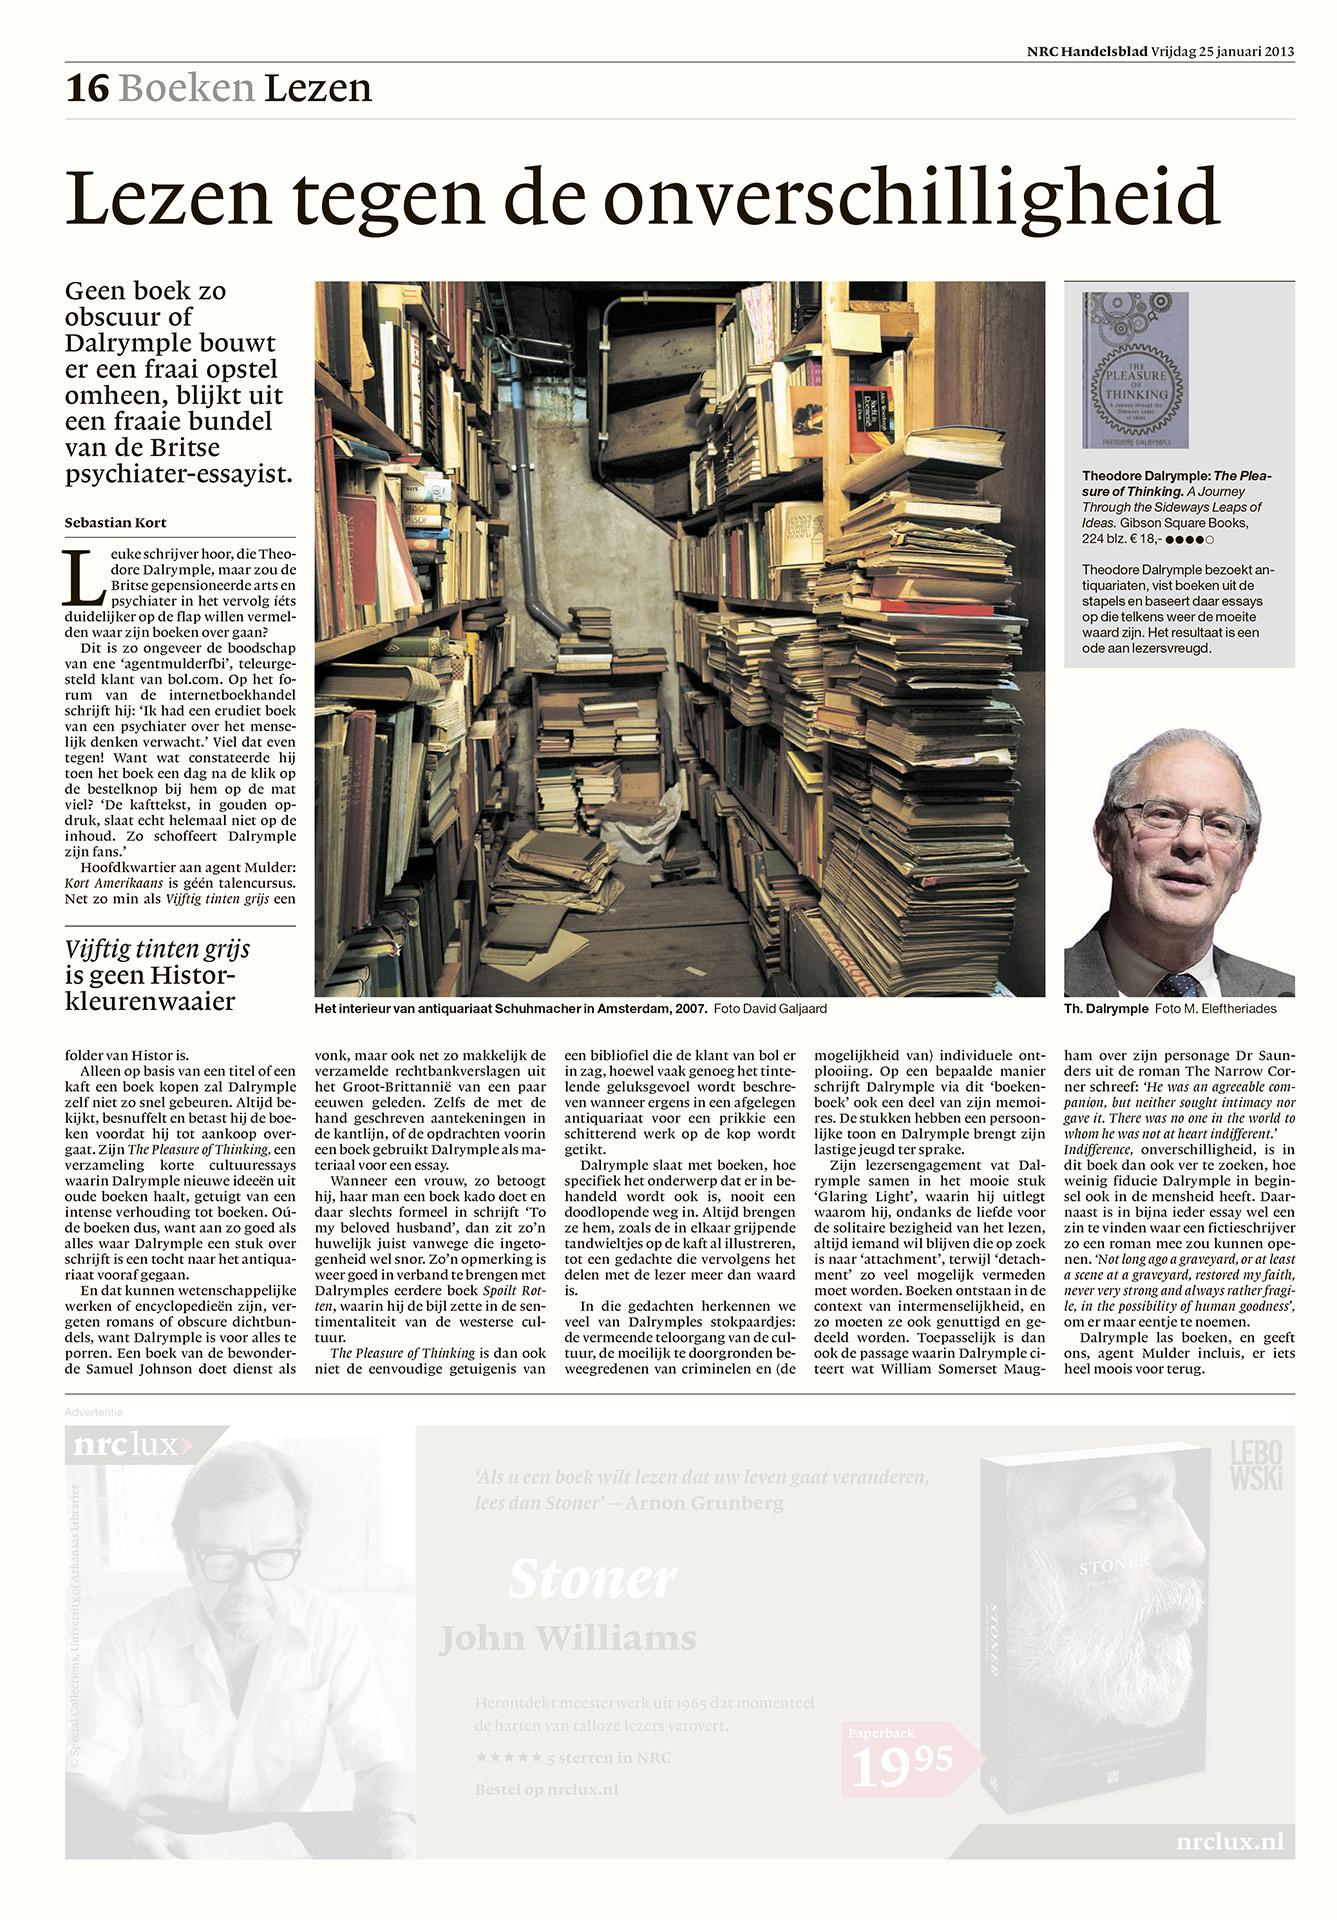 NRC Handelsblad - boeken - 2015 - David Galjaard